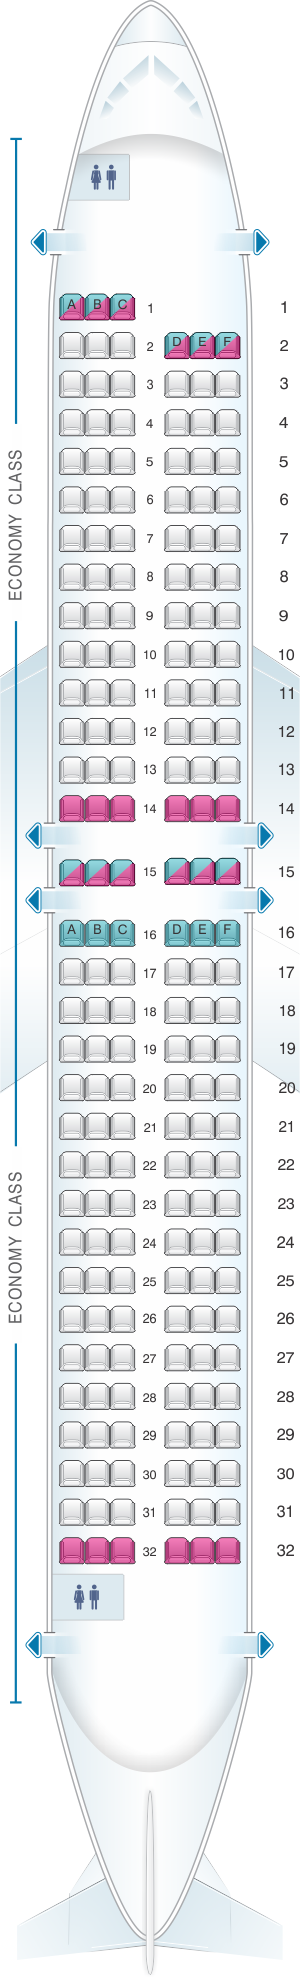 Seat map for Norwegian Boeing B737 MAX 8